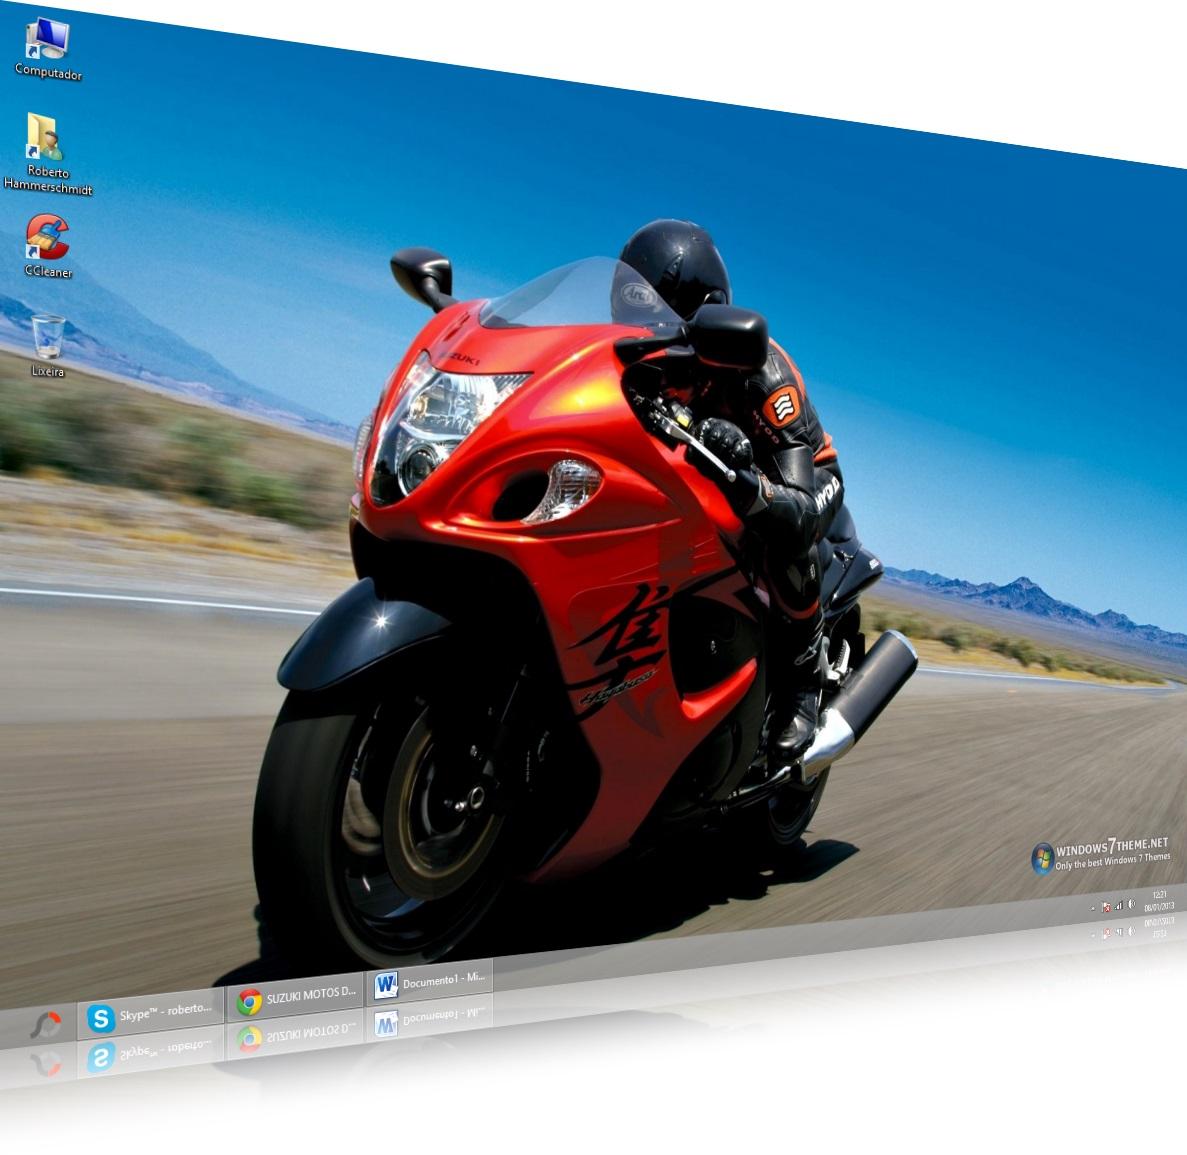 Suzuki Hayabusa Windows 7 Theme - Imagem 1 do software